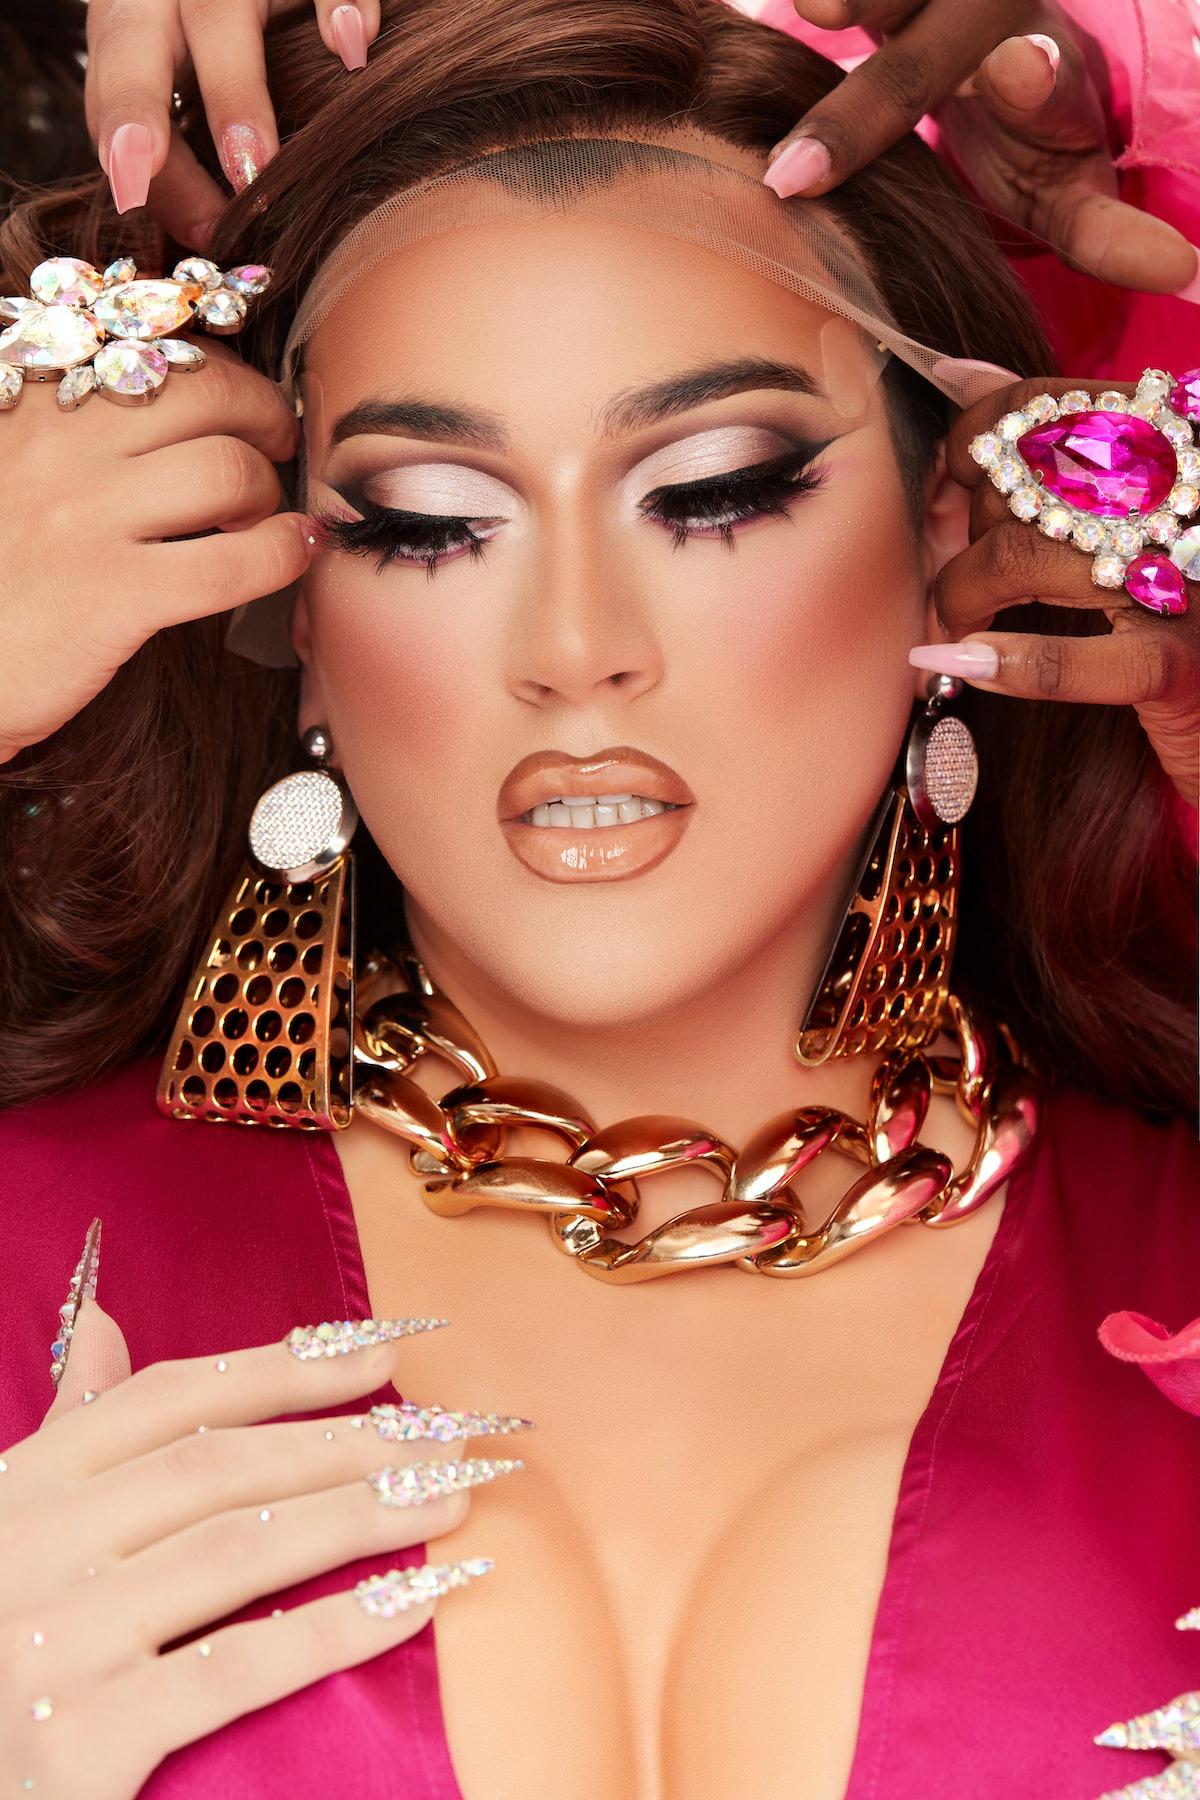 Manny Gutierrez, aka Manny MUA, posing in drag for Lunar Beauty's new Life's A Drag Facelift palette.